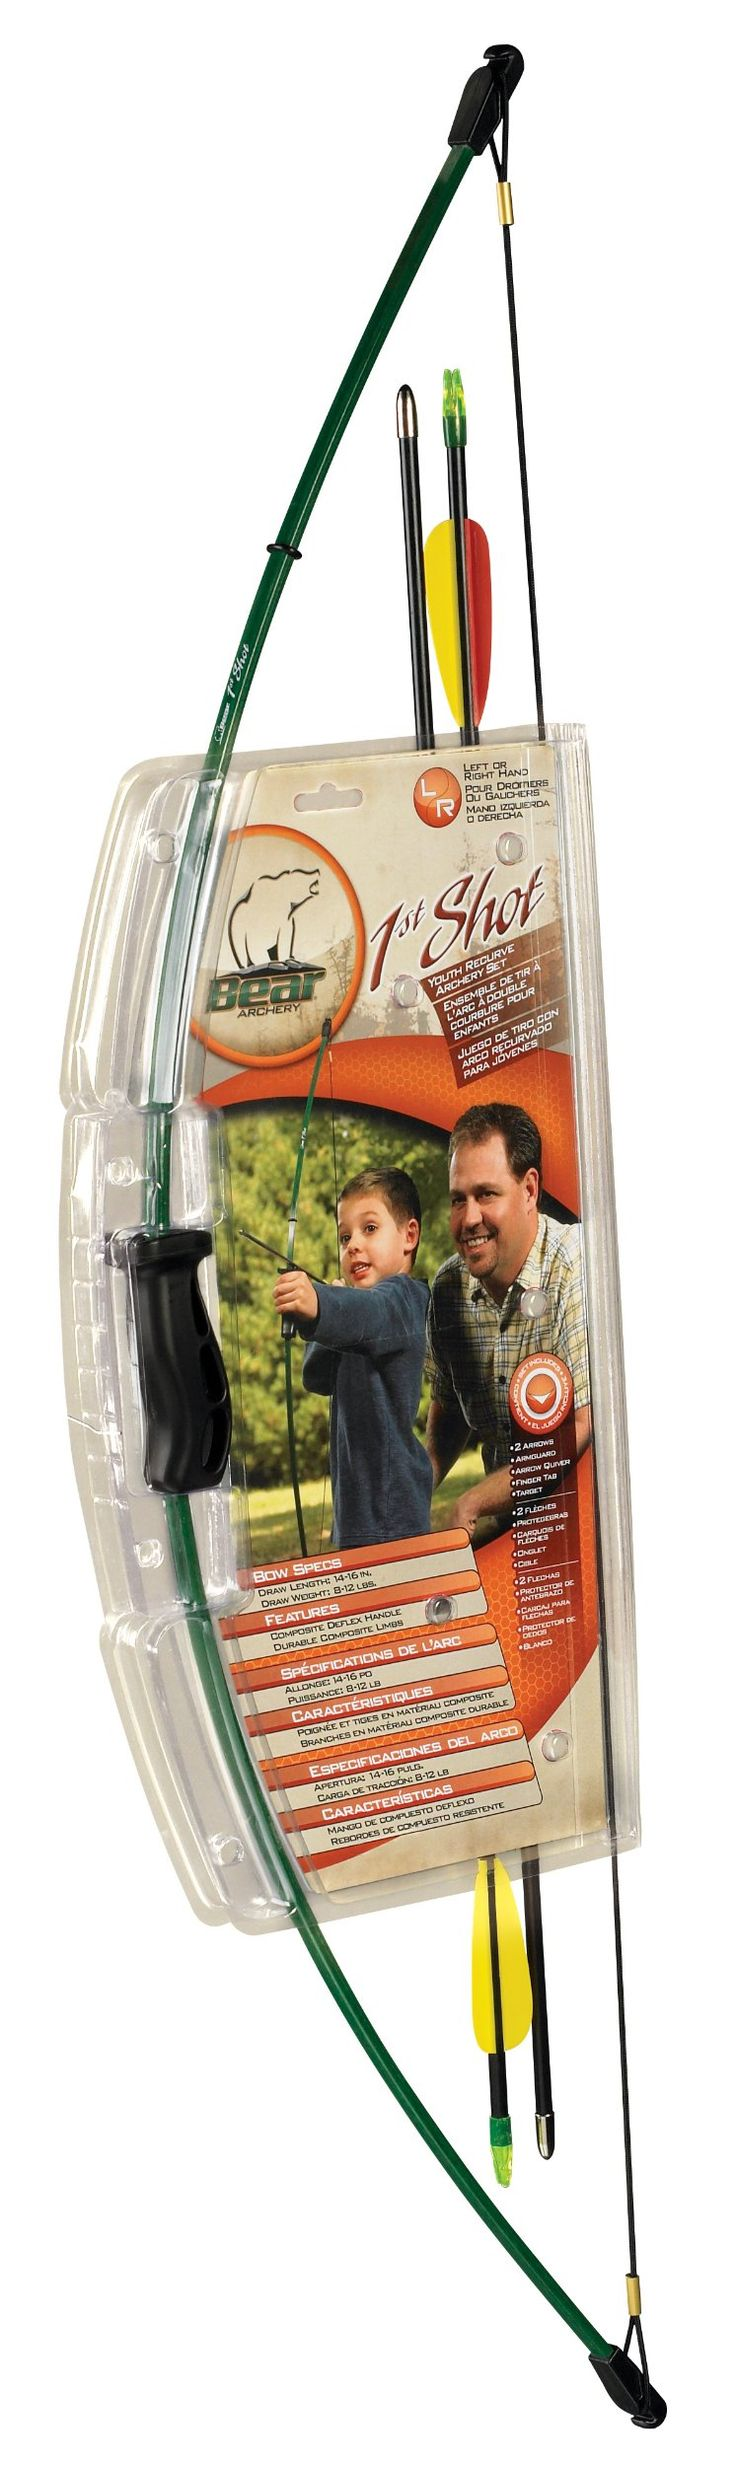 Kadin- Amazon.com : Bear Archery First Shot Youth Bow Set : Bow And Arrow : Sports & Outdoors